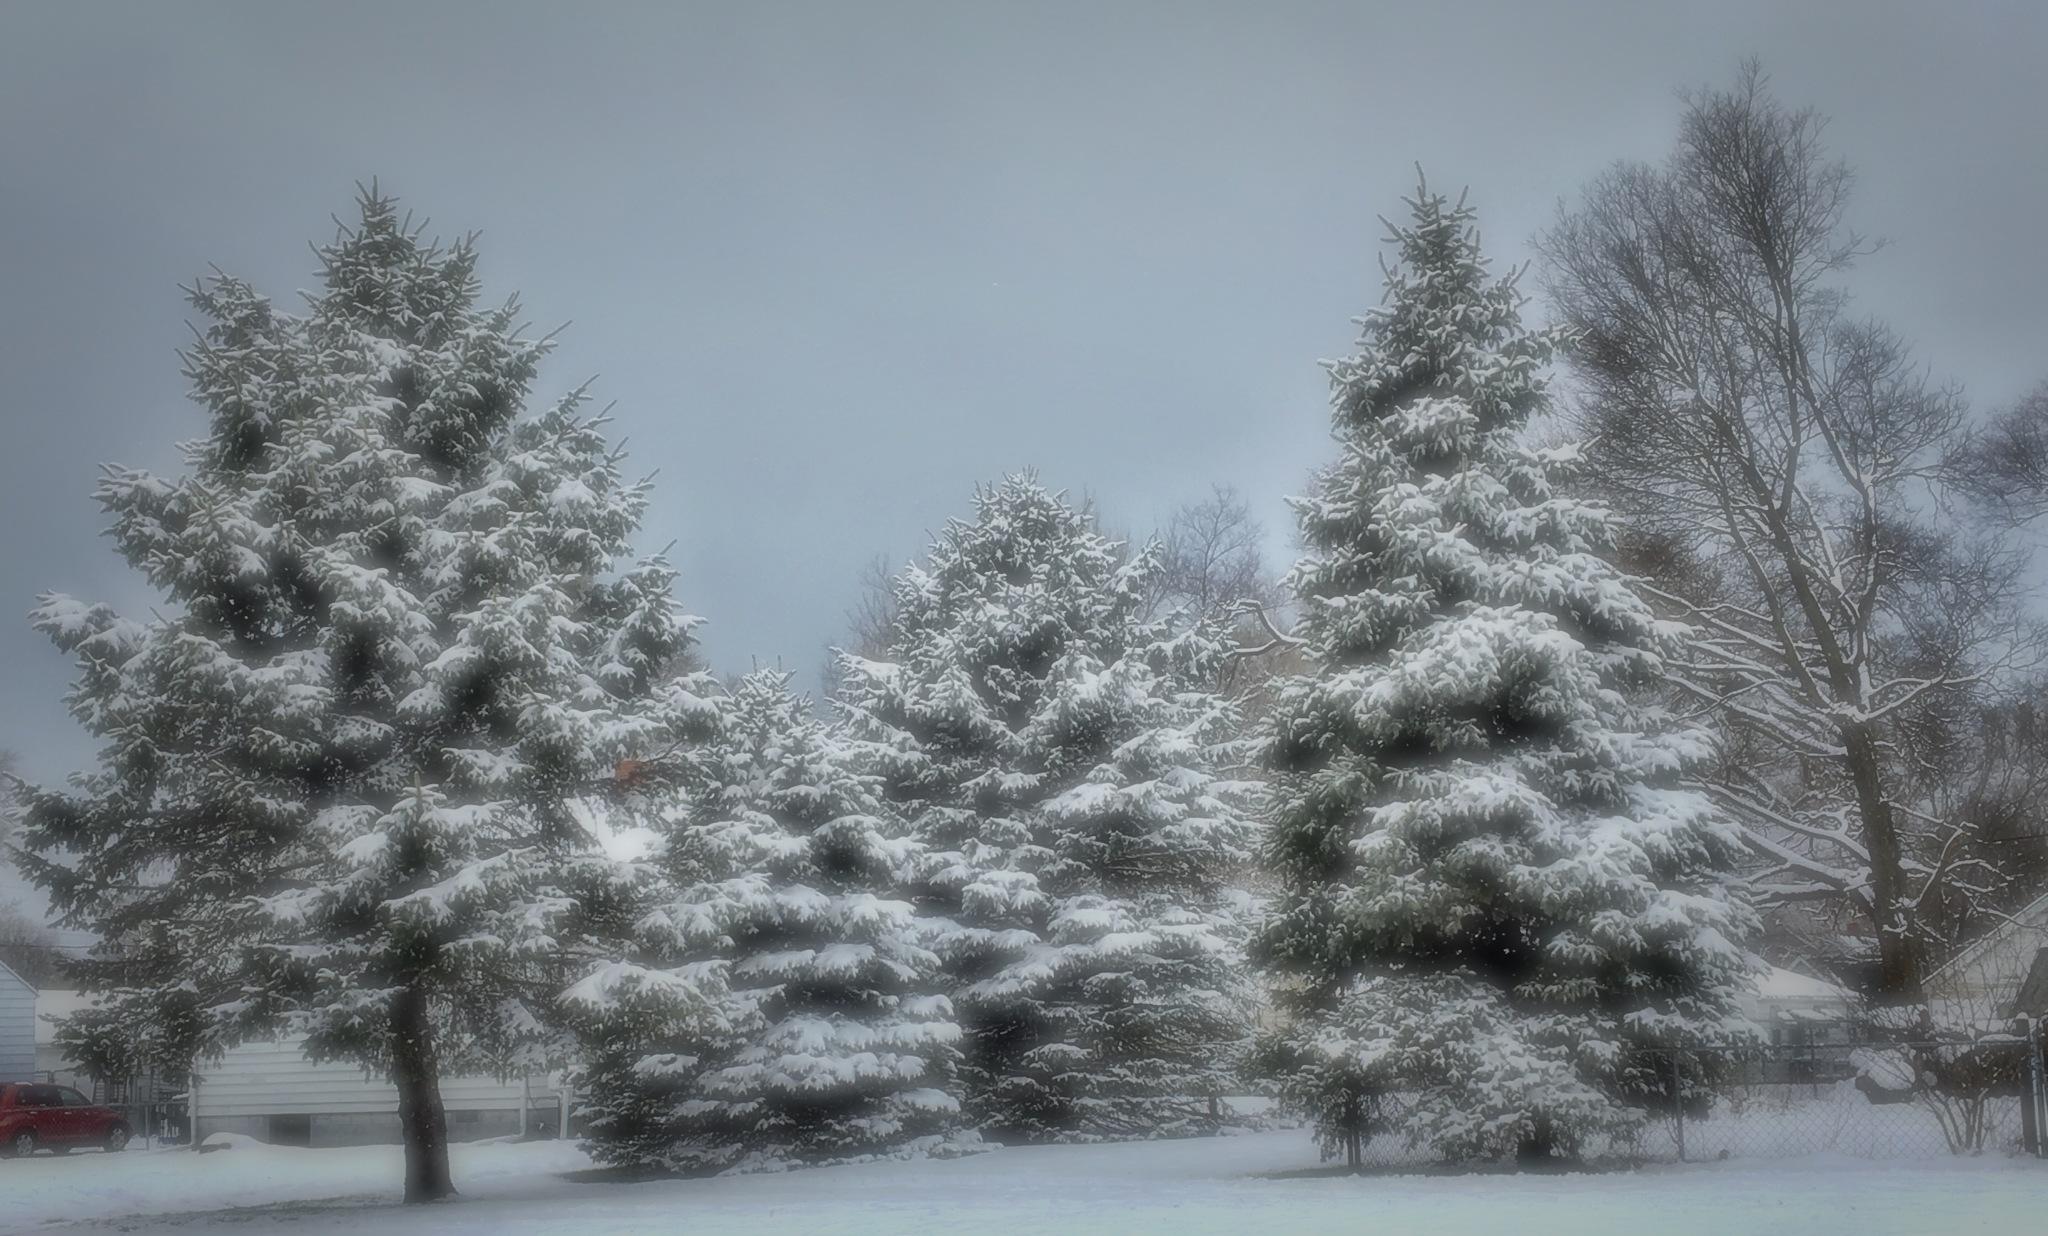 Last Blast of Winter by Mark Hootman